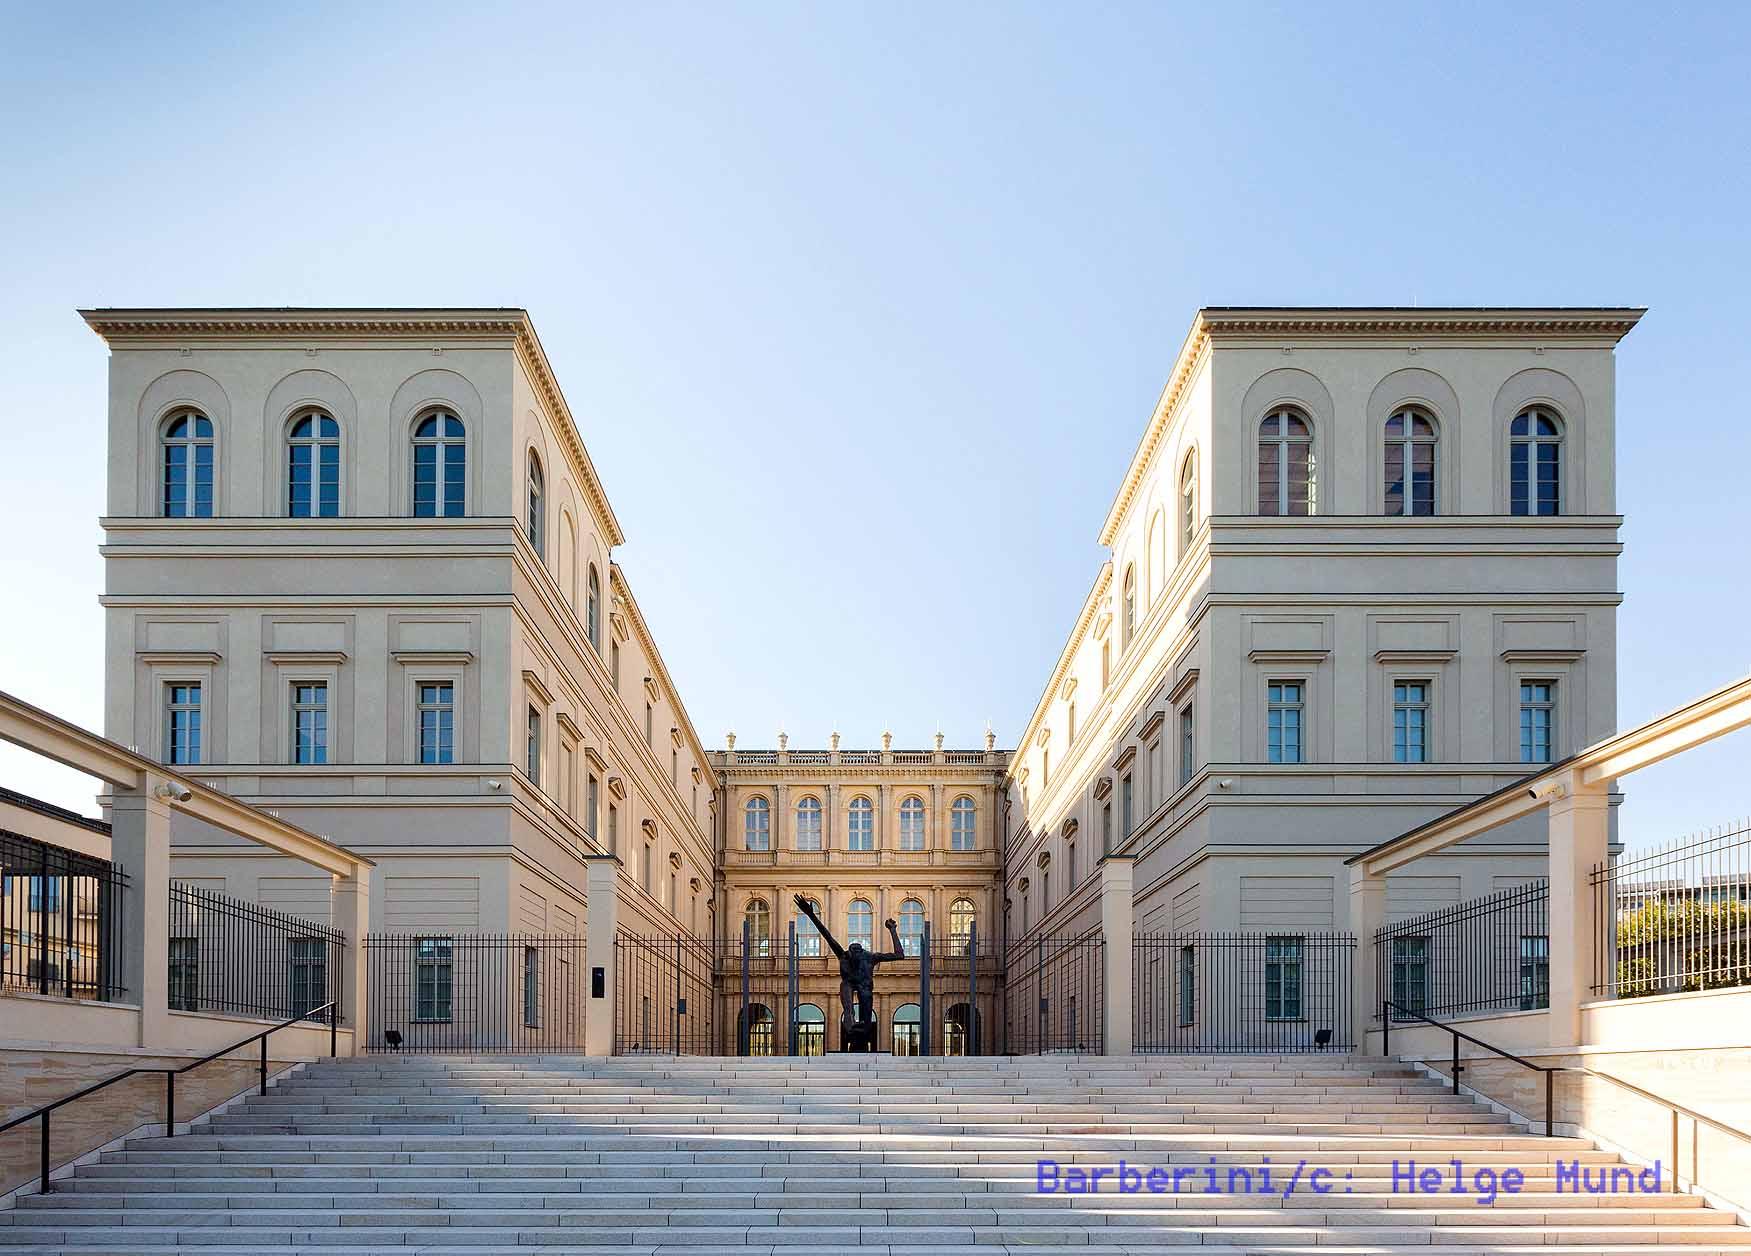 Museum Barberini, Rückansicht, Photo: Helge Mundt